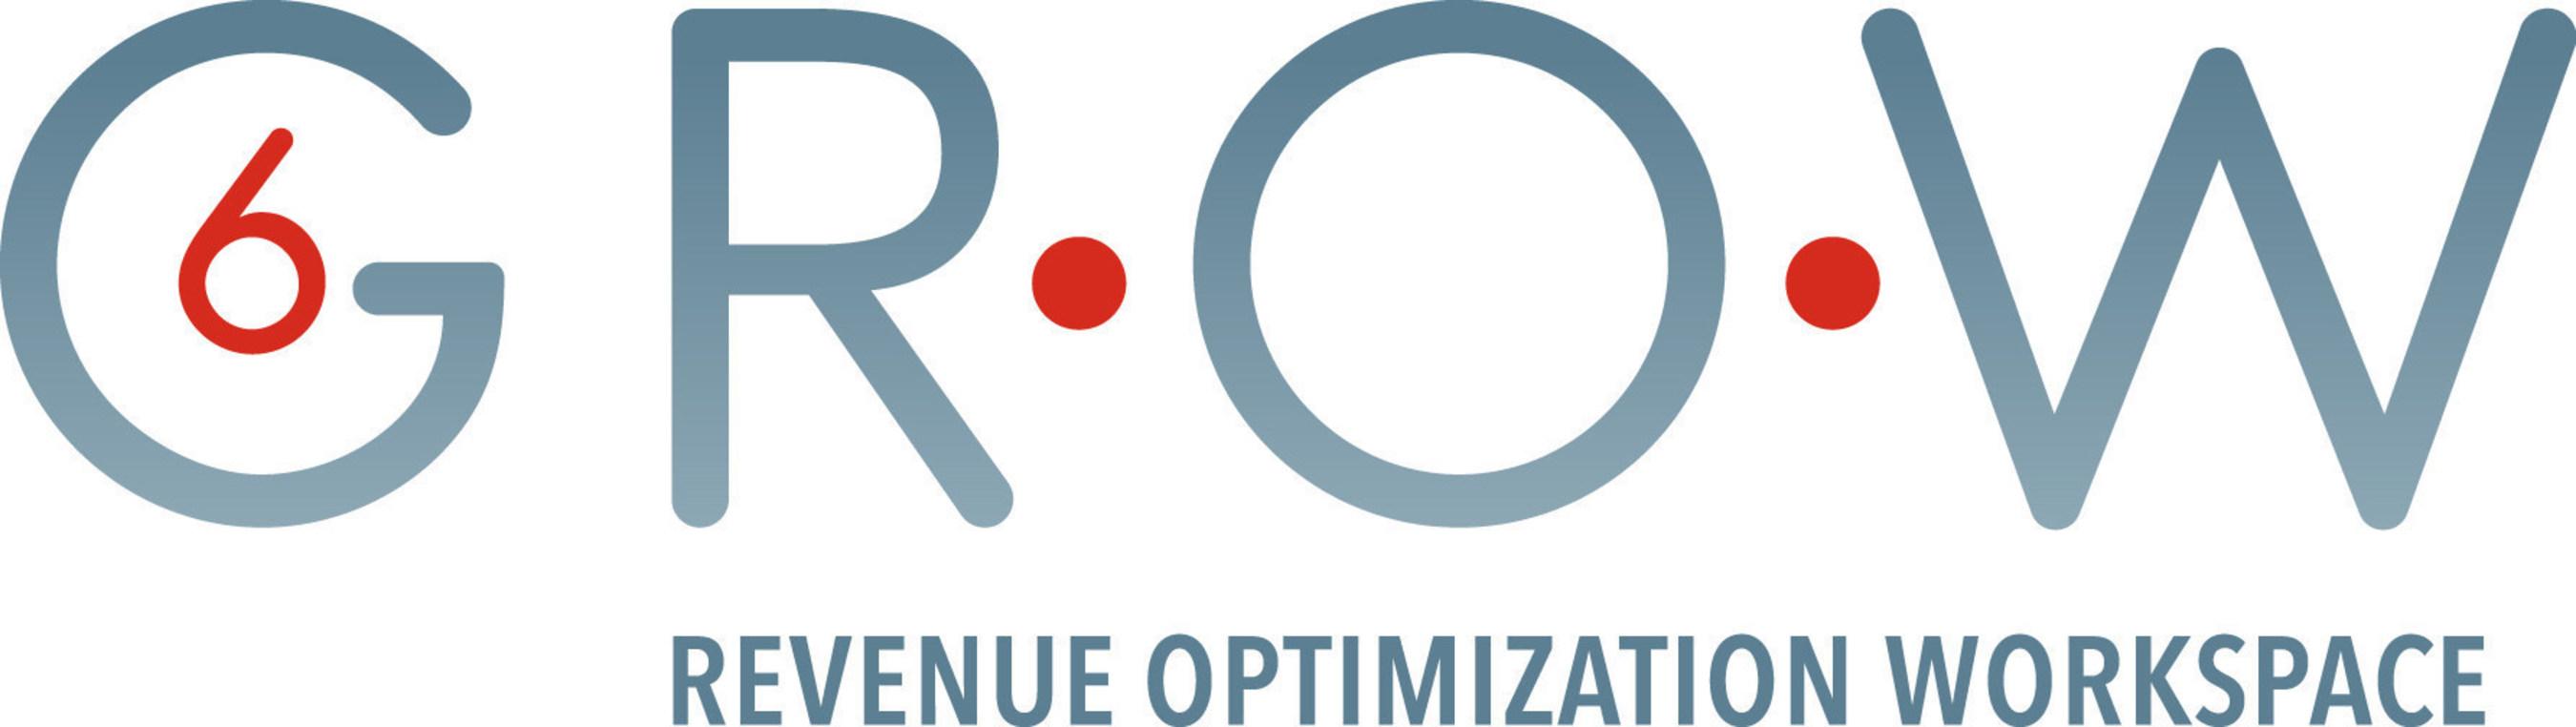 G6ROW_Revenue_Optimization_Workspace_Logo